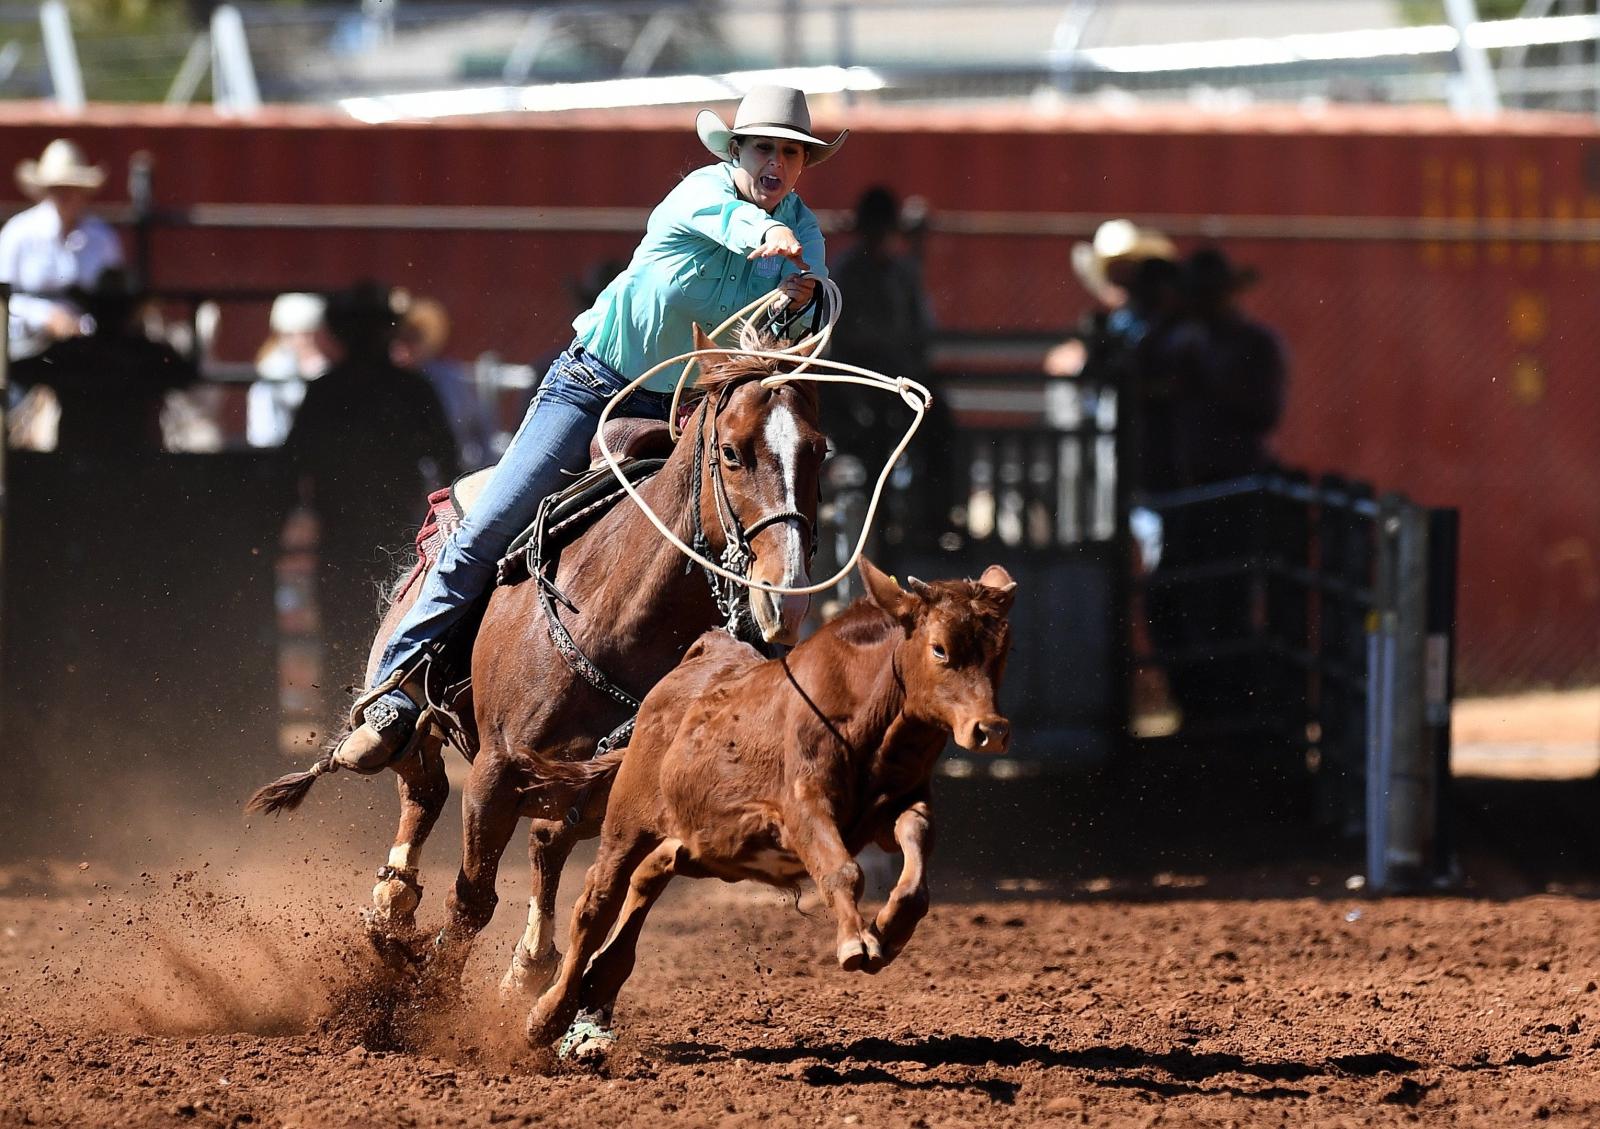 Rodeo w Australii EPA/DAN PELED  AUSTRALIA AND NEW ZEALAND OUT